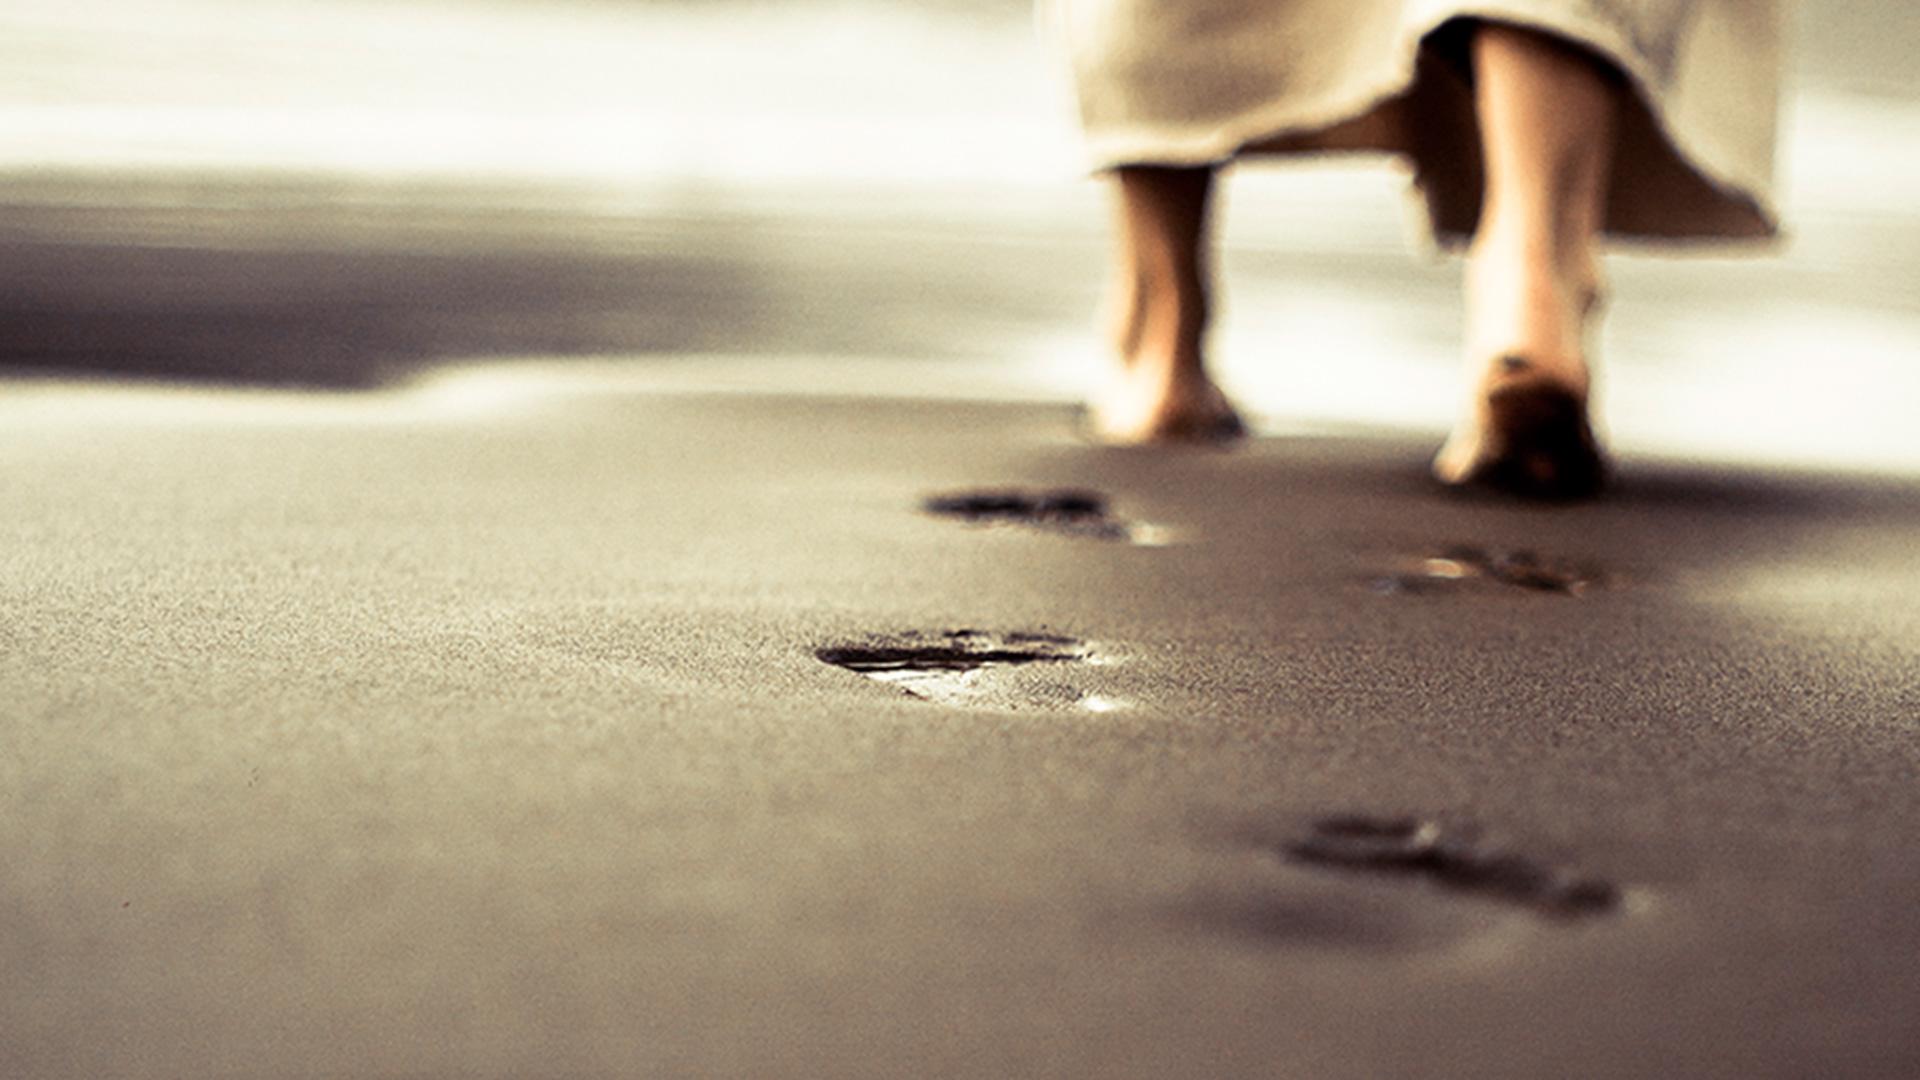 Jesus-walking-on-beach-1920×1080